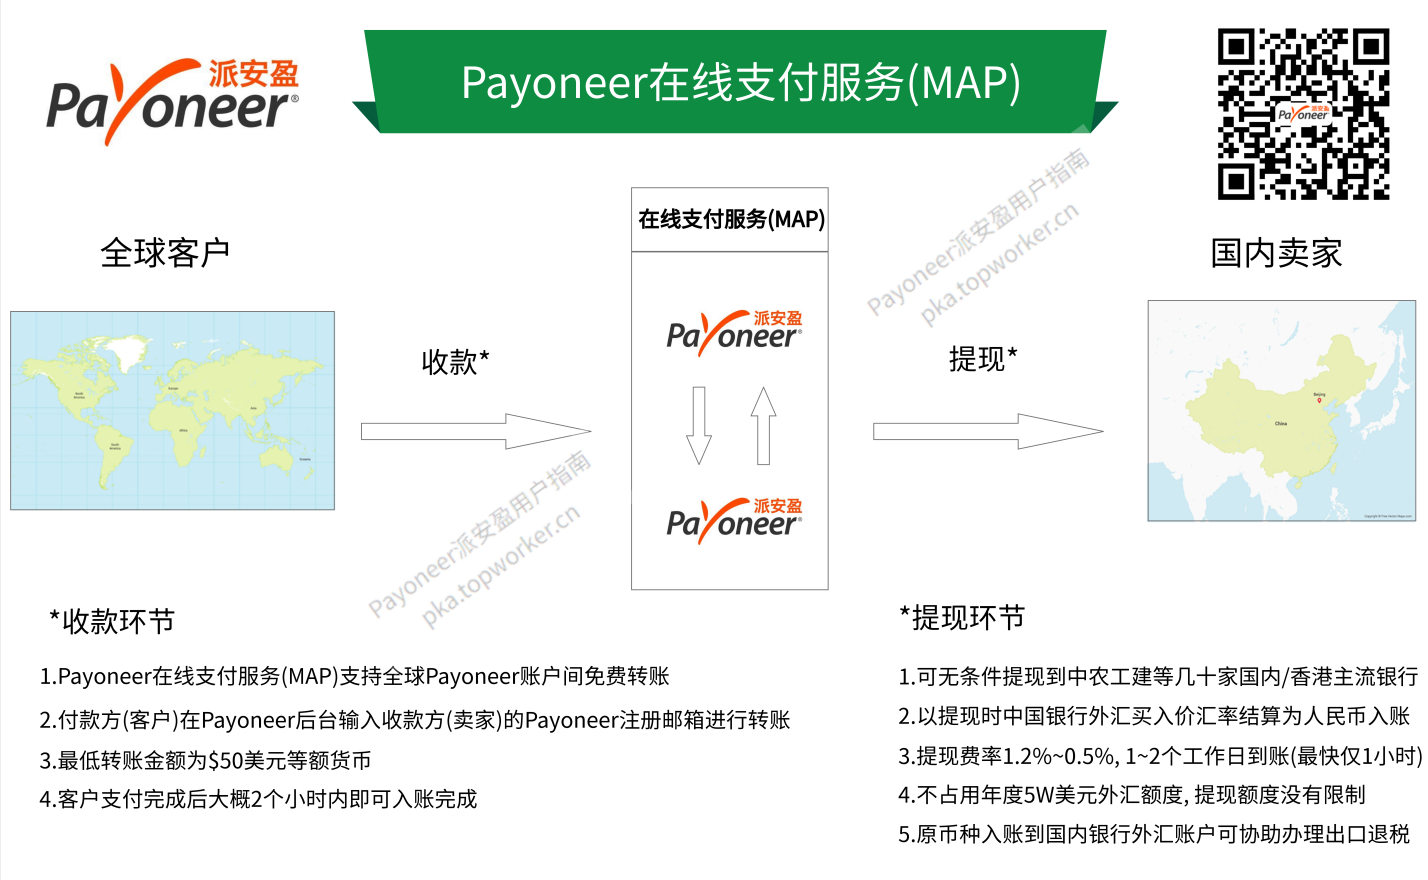 Payoneer在线支付服务-收款流程图